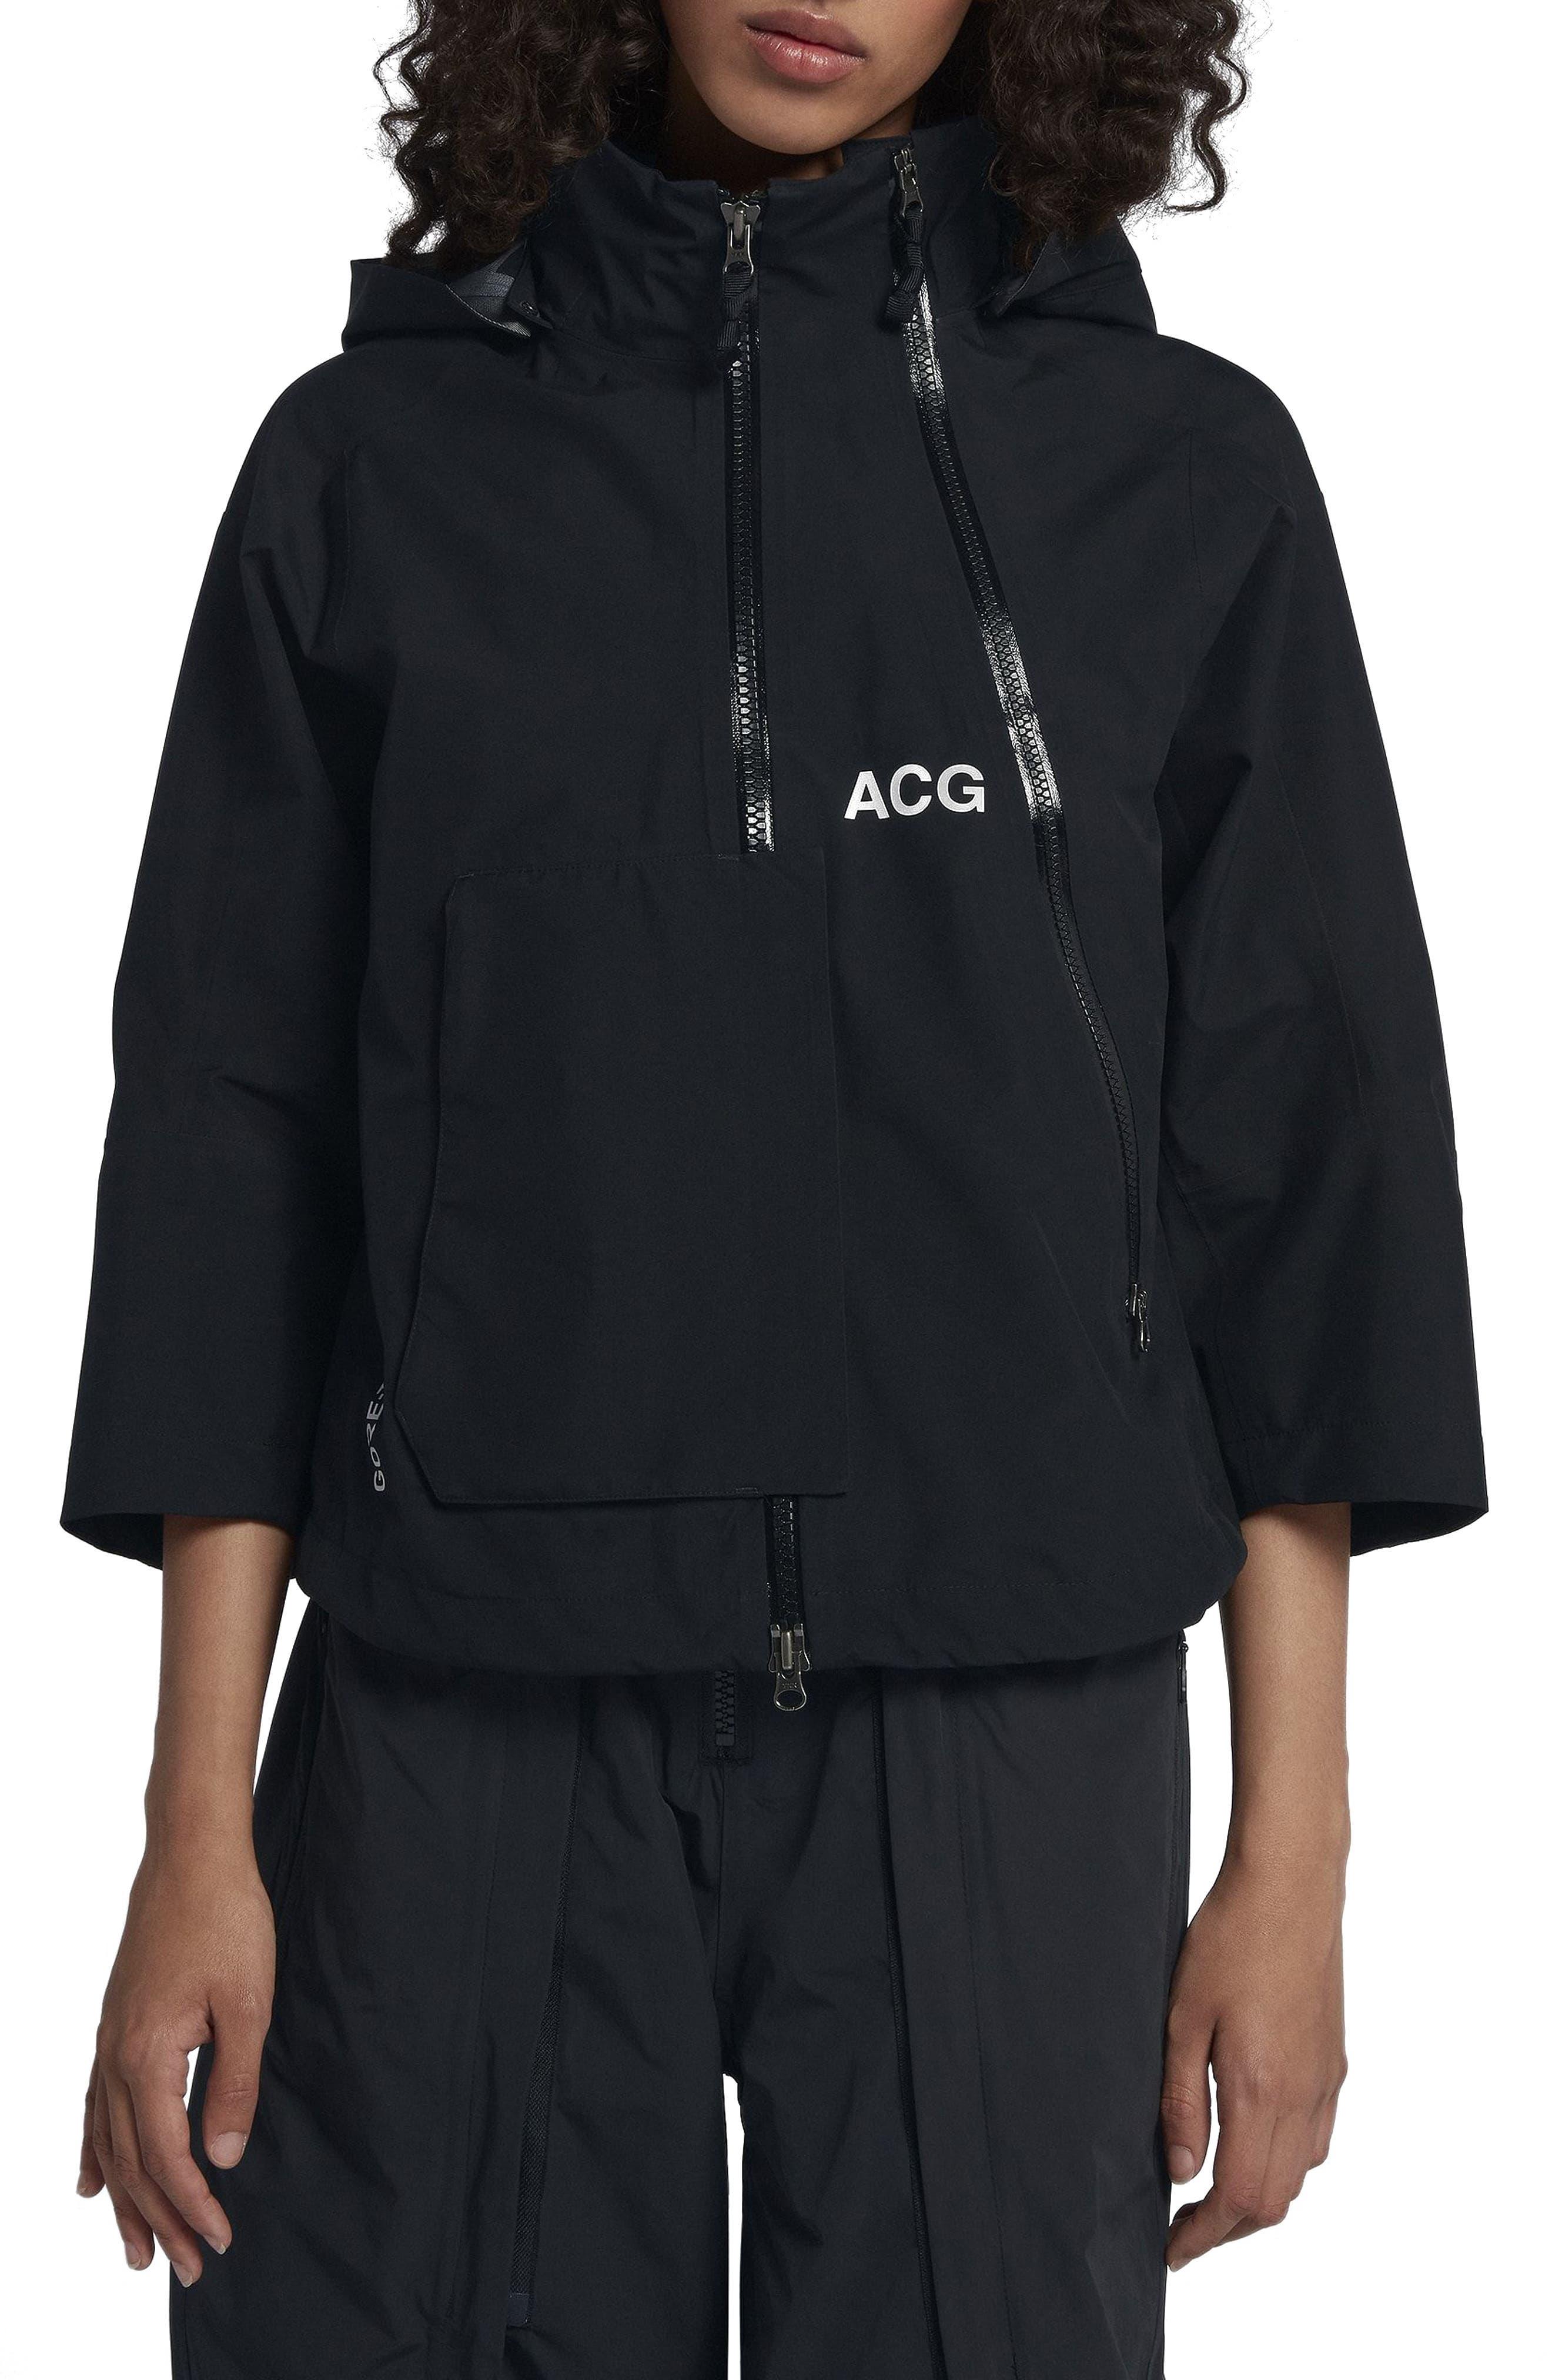 NikeLab ACG Gore-Tex<sup>®</sup> Women's Jacket,                             Alternate thumbnail 2, color,                             010